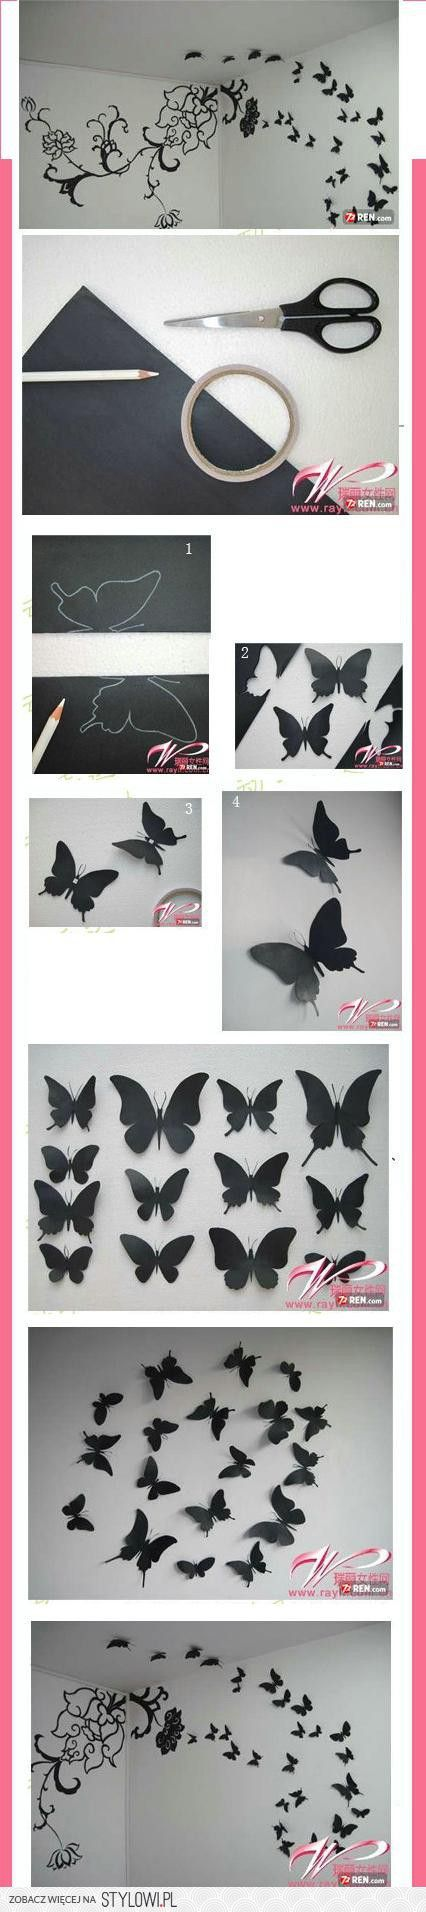 renkli-el-isi-kagidindan-duvara-kelebek-motifleri-yapmak